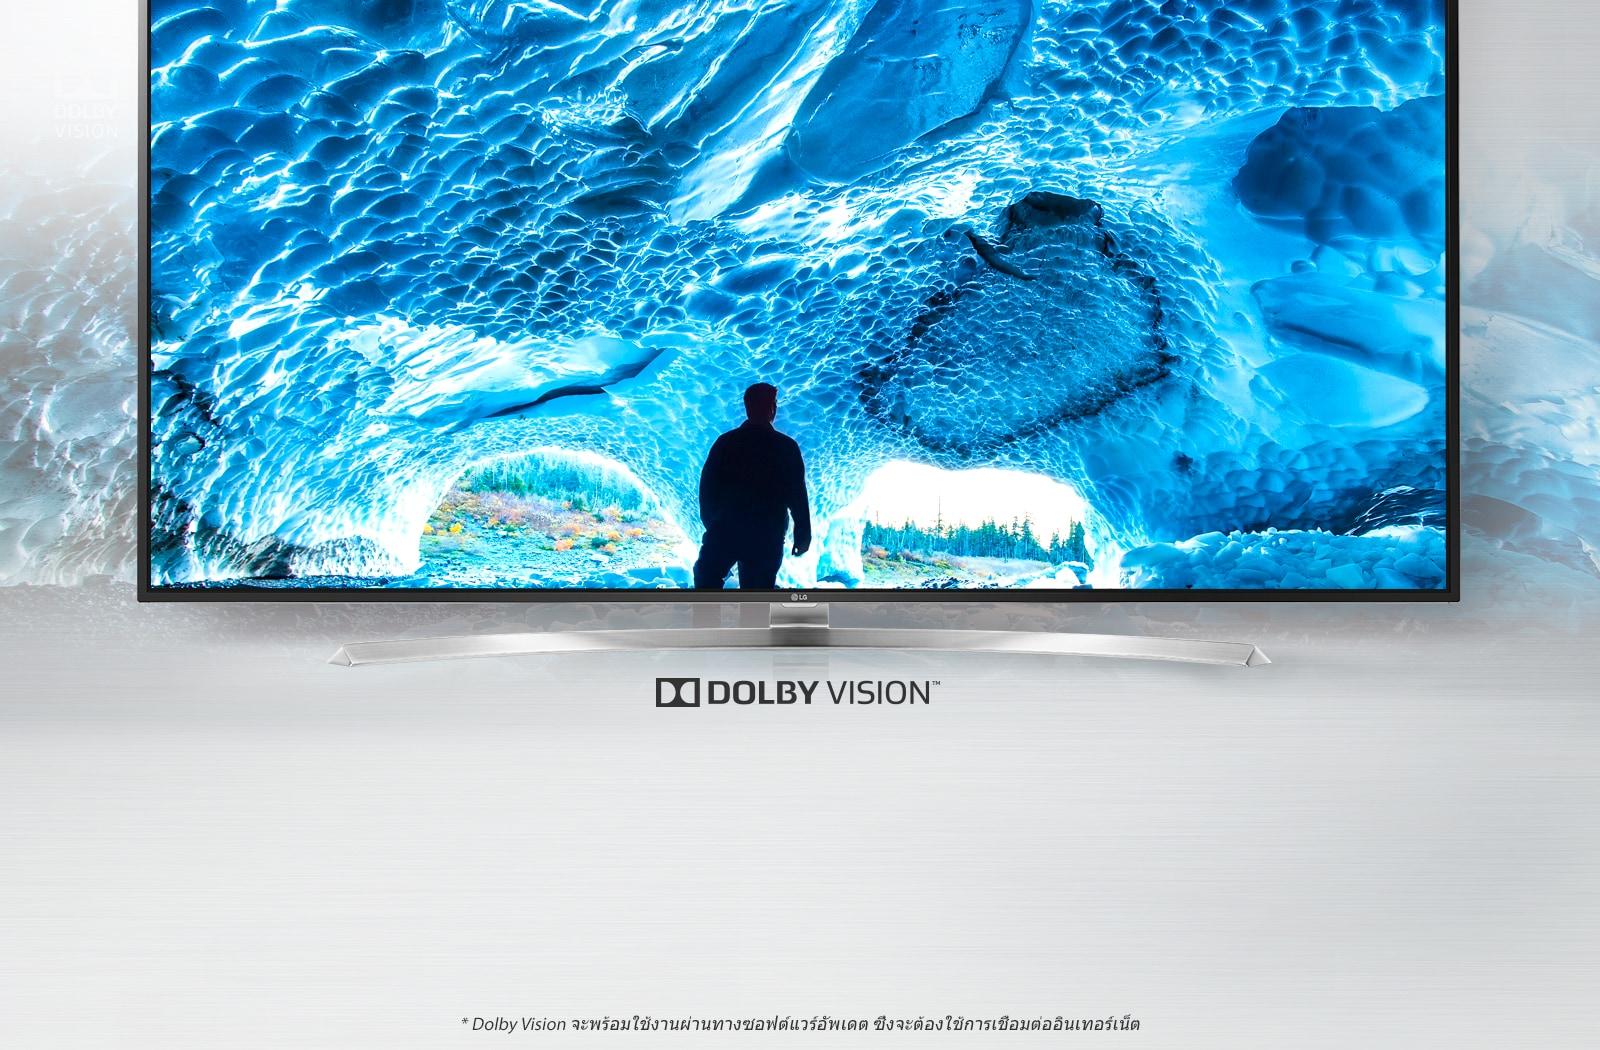 DolbyVision เหตุใดจึงสำคัญ?